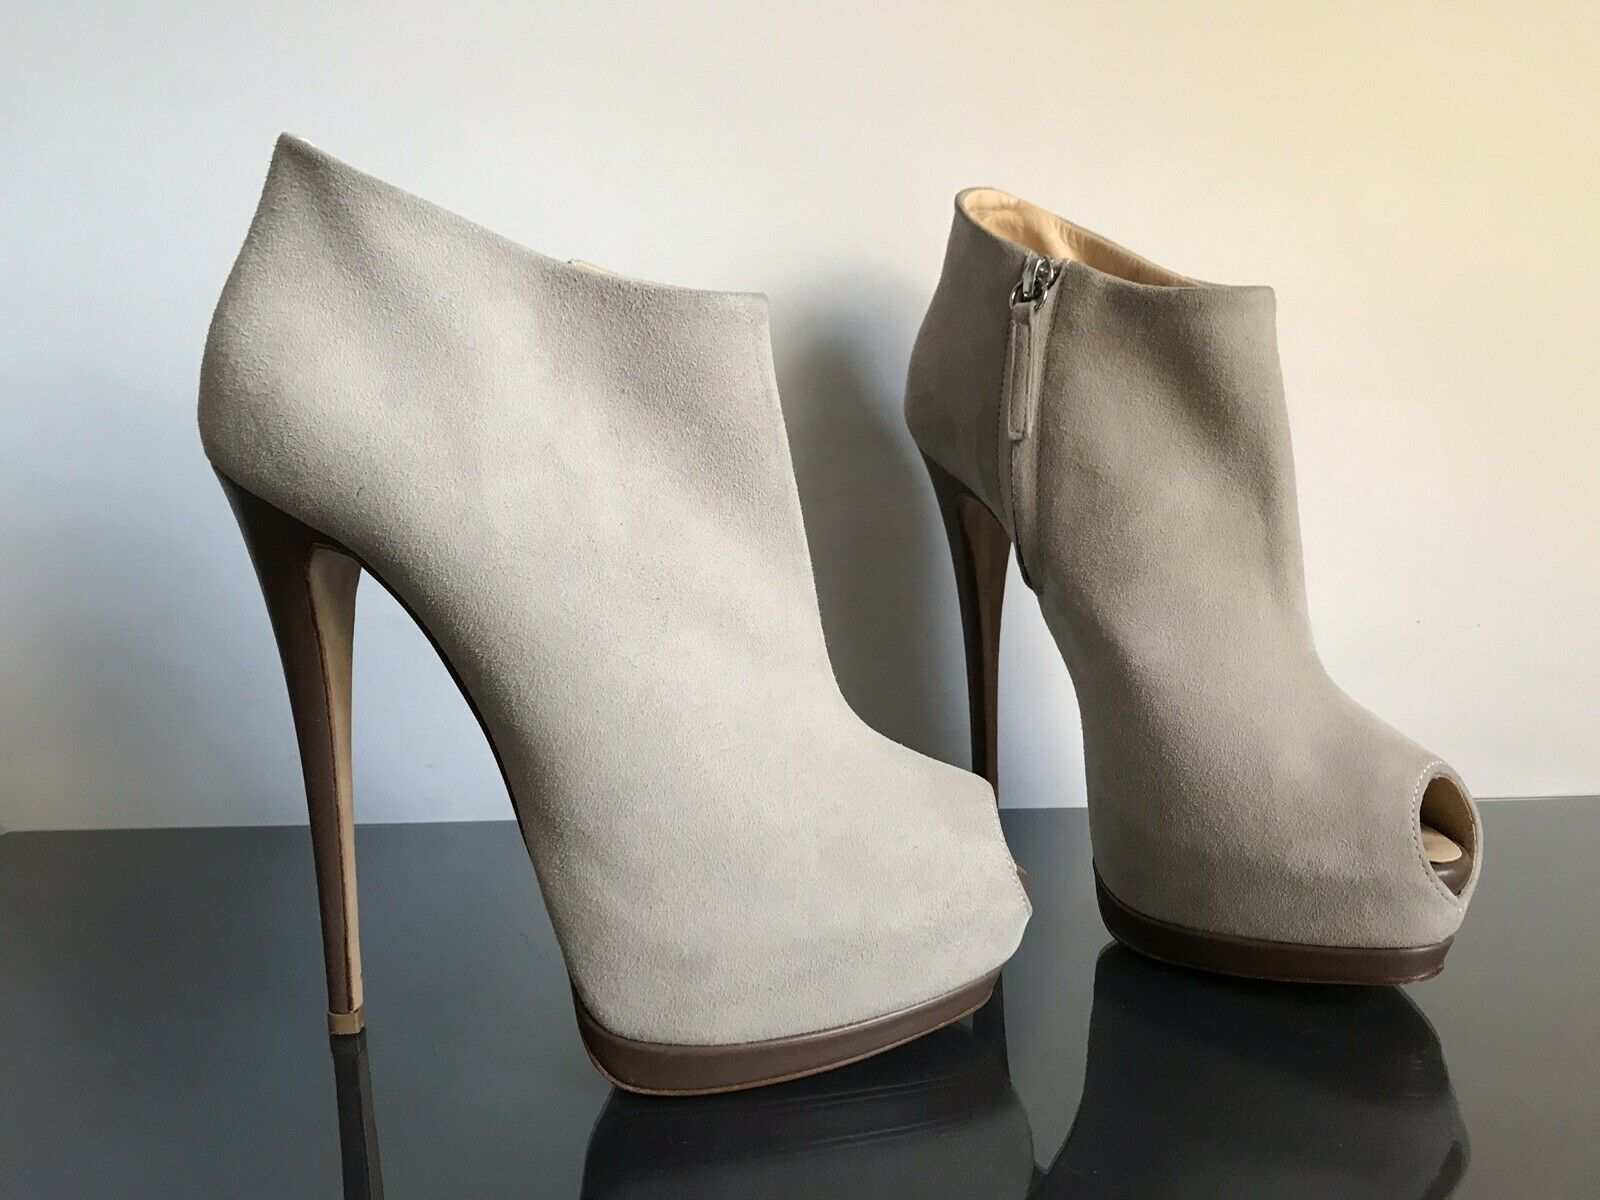 W.neu Giuseppe Zanotti  39 High Heels Peep Toe Suede Stiefel Plateau Stiletto